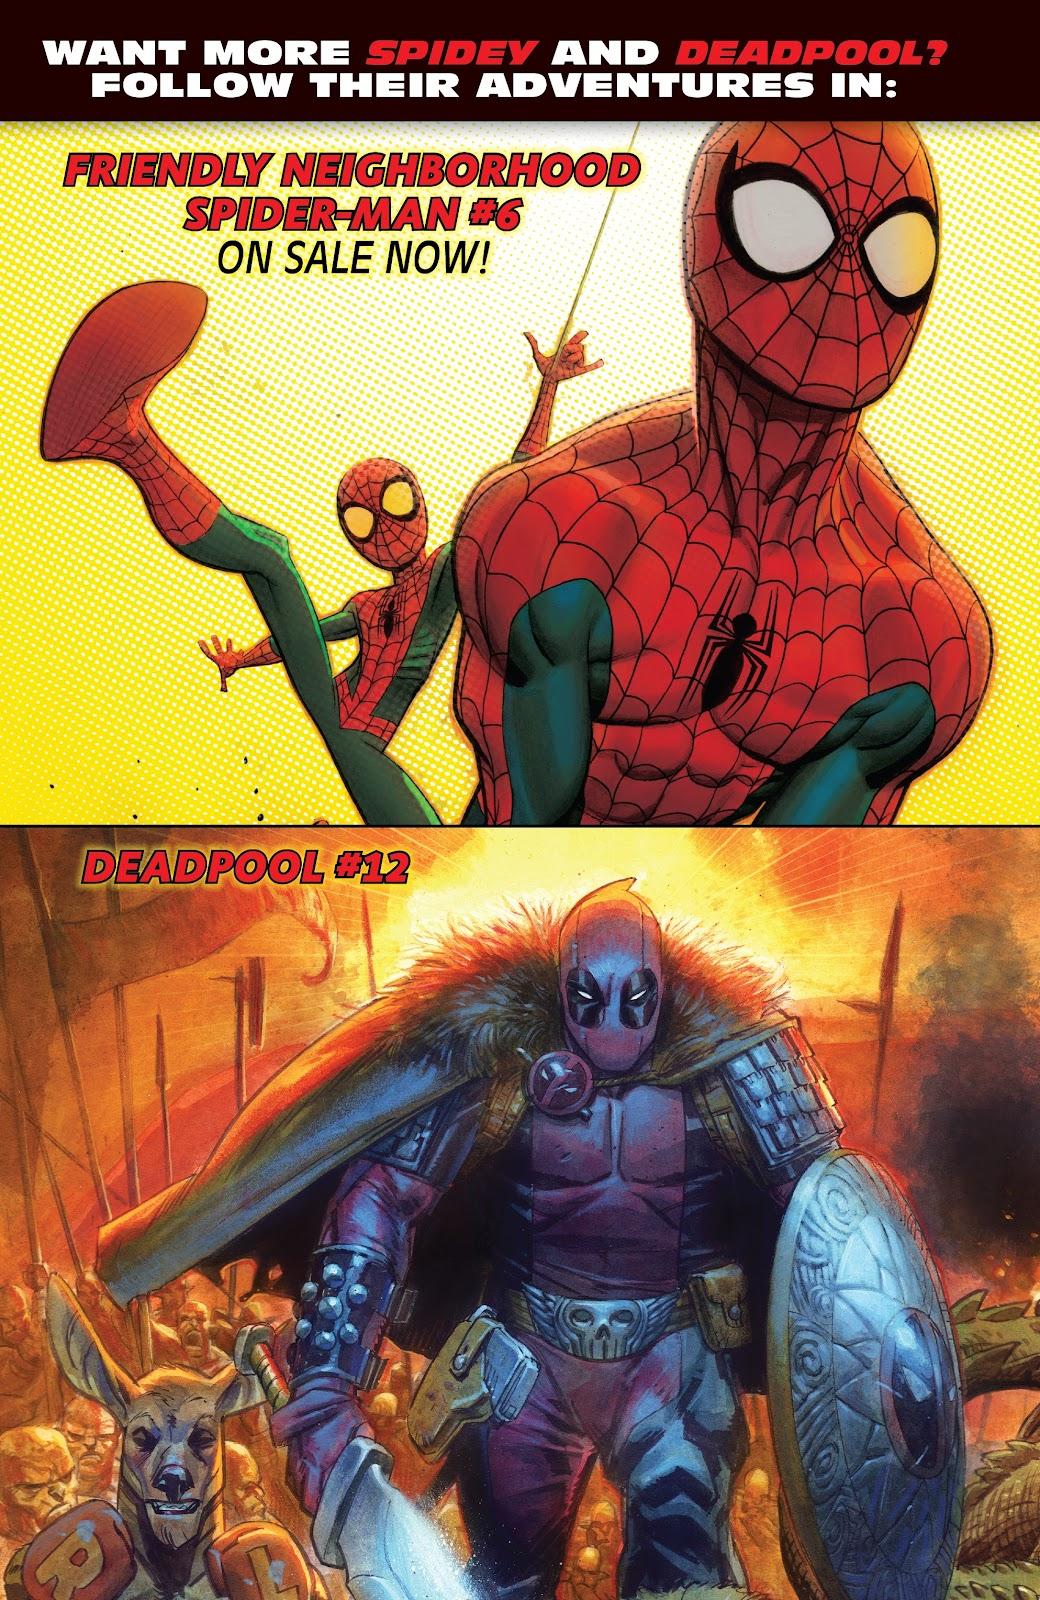 Read online Spider-Man/Deadpool comic -  Issue #50 - 31